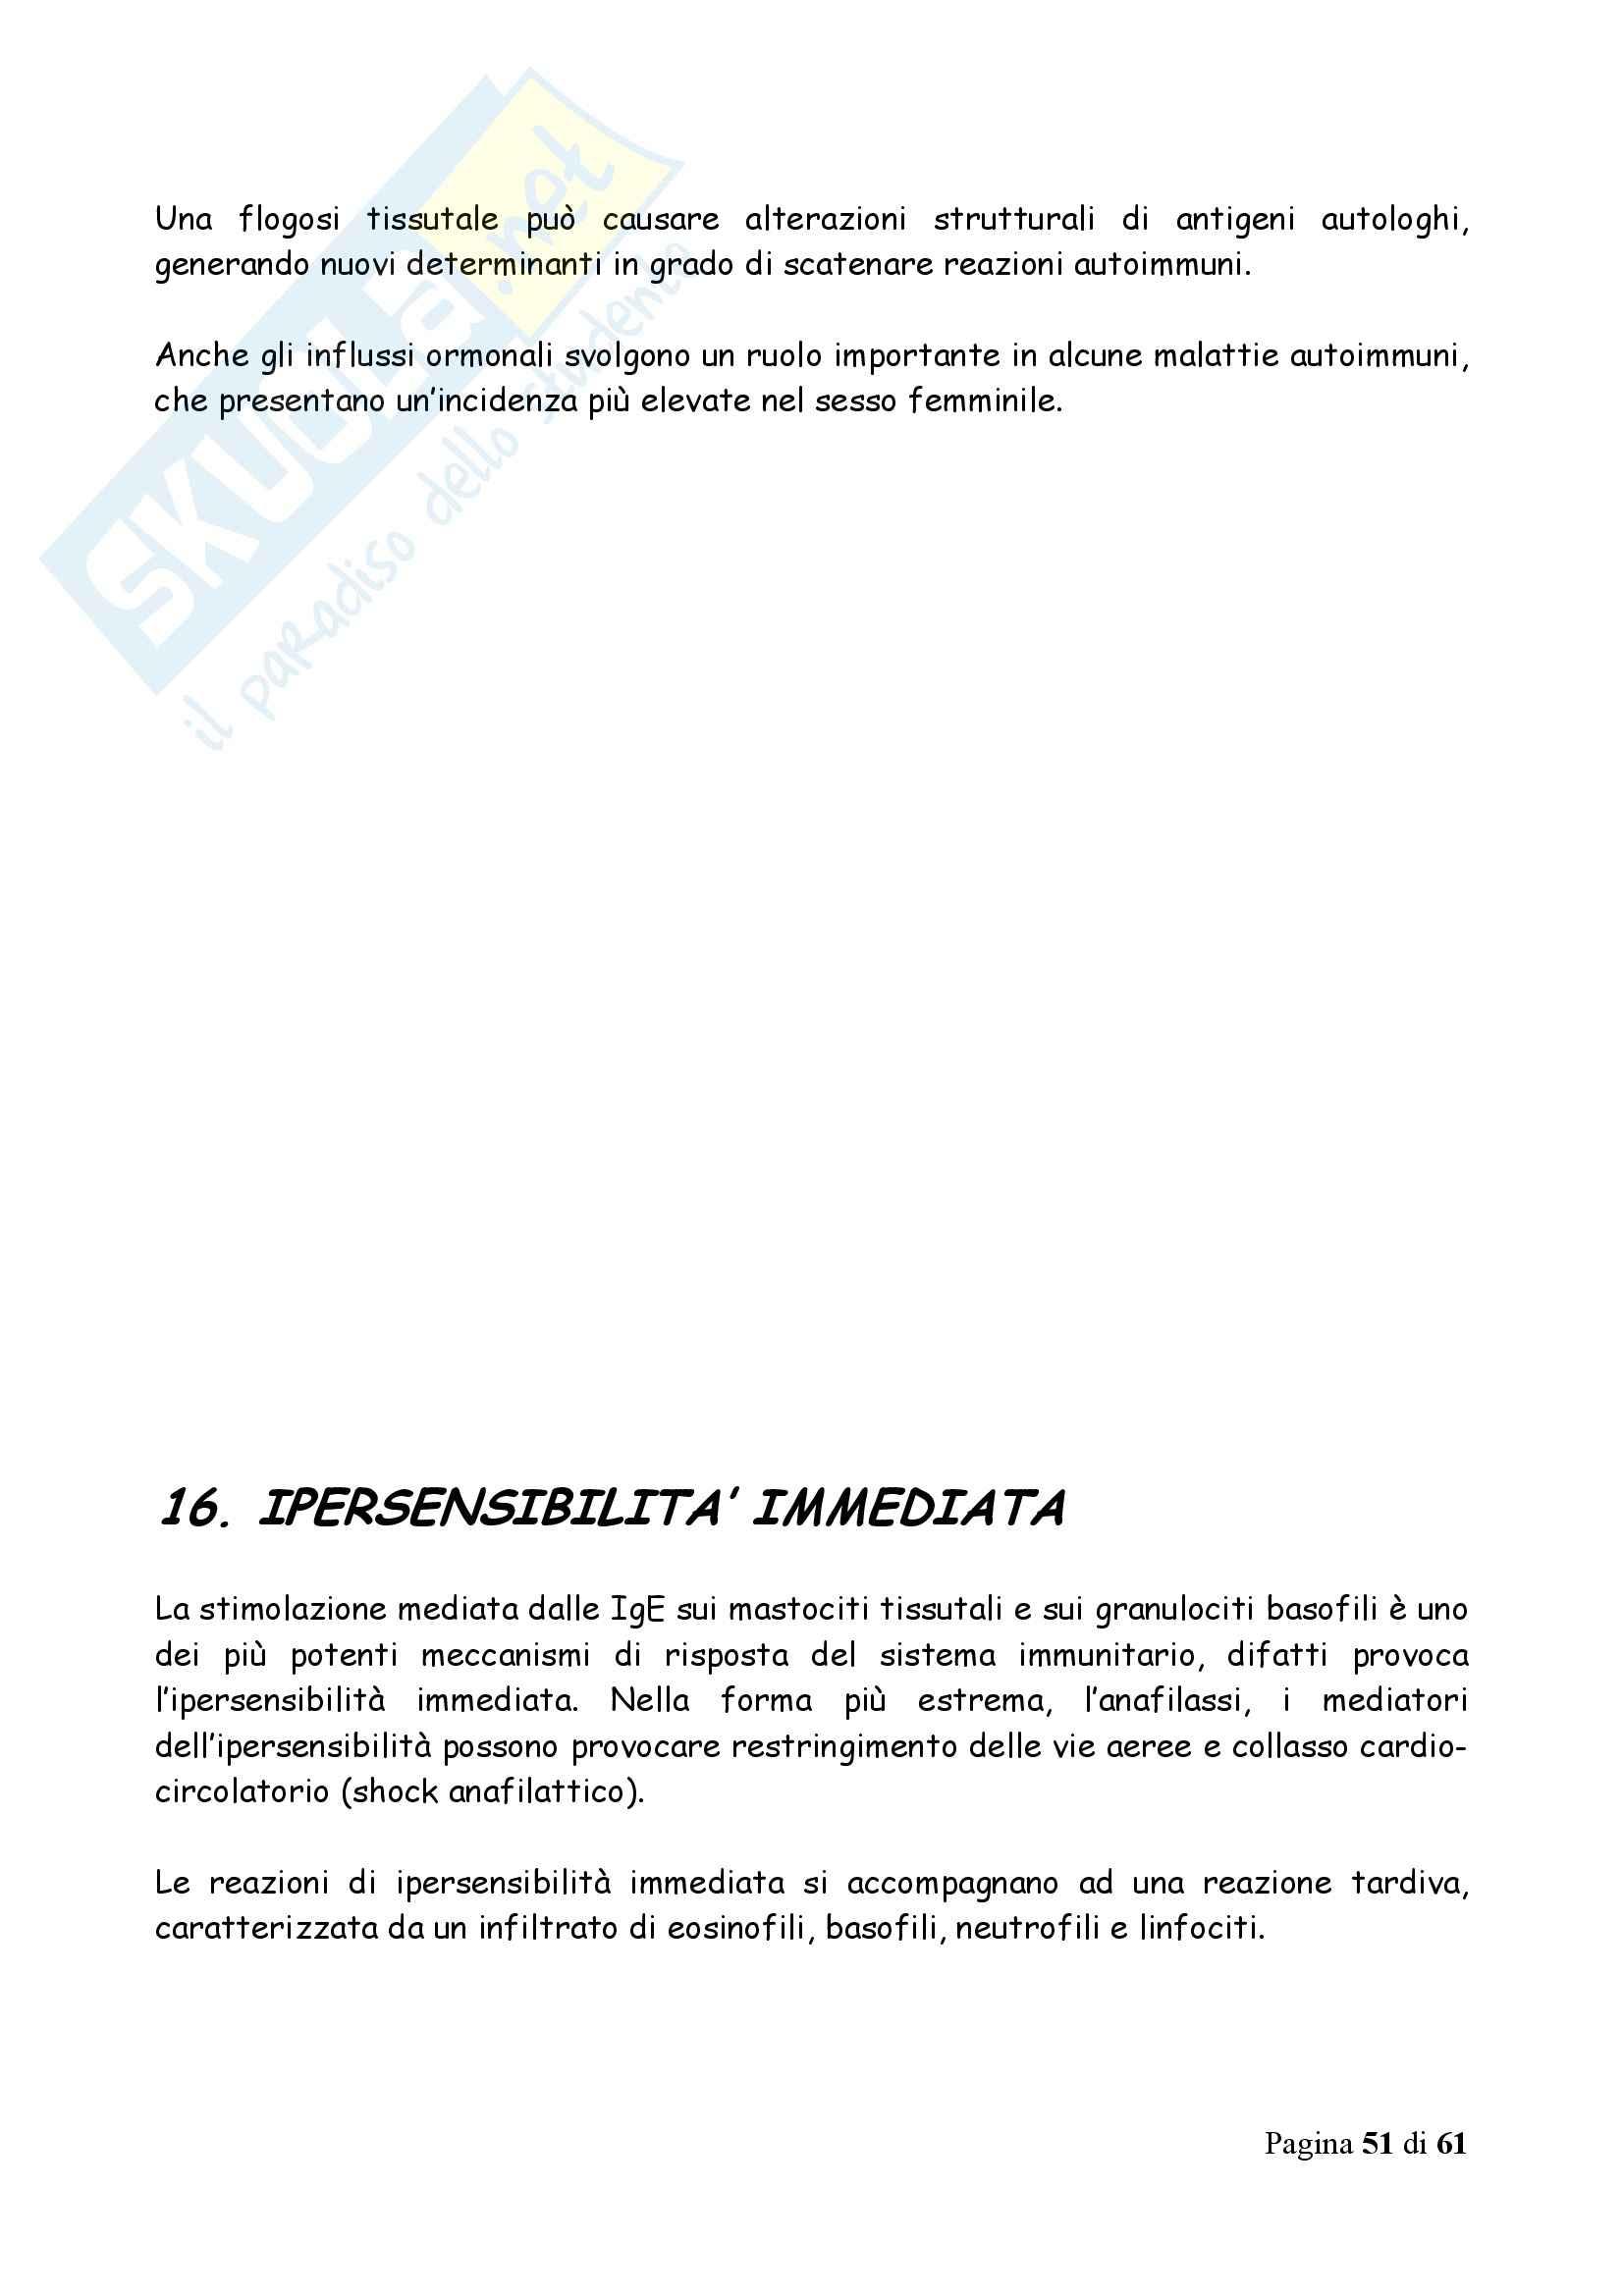 Immunologia - Appunti Pag. 51